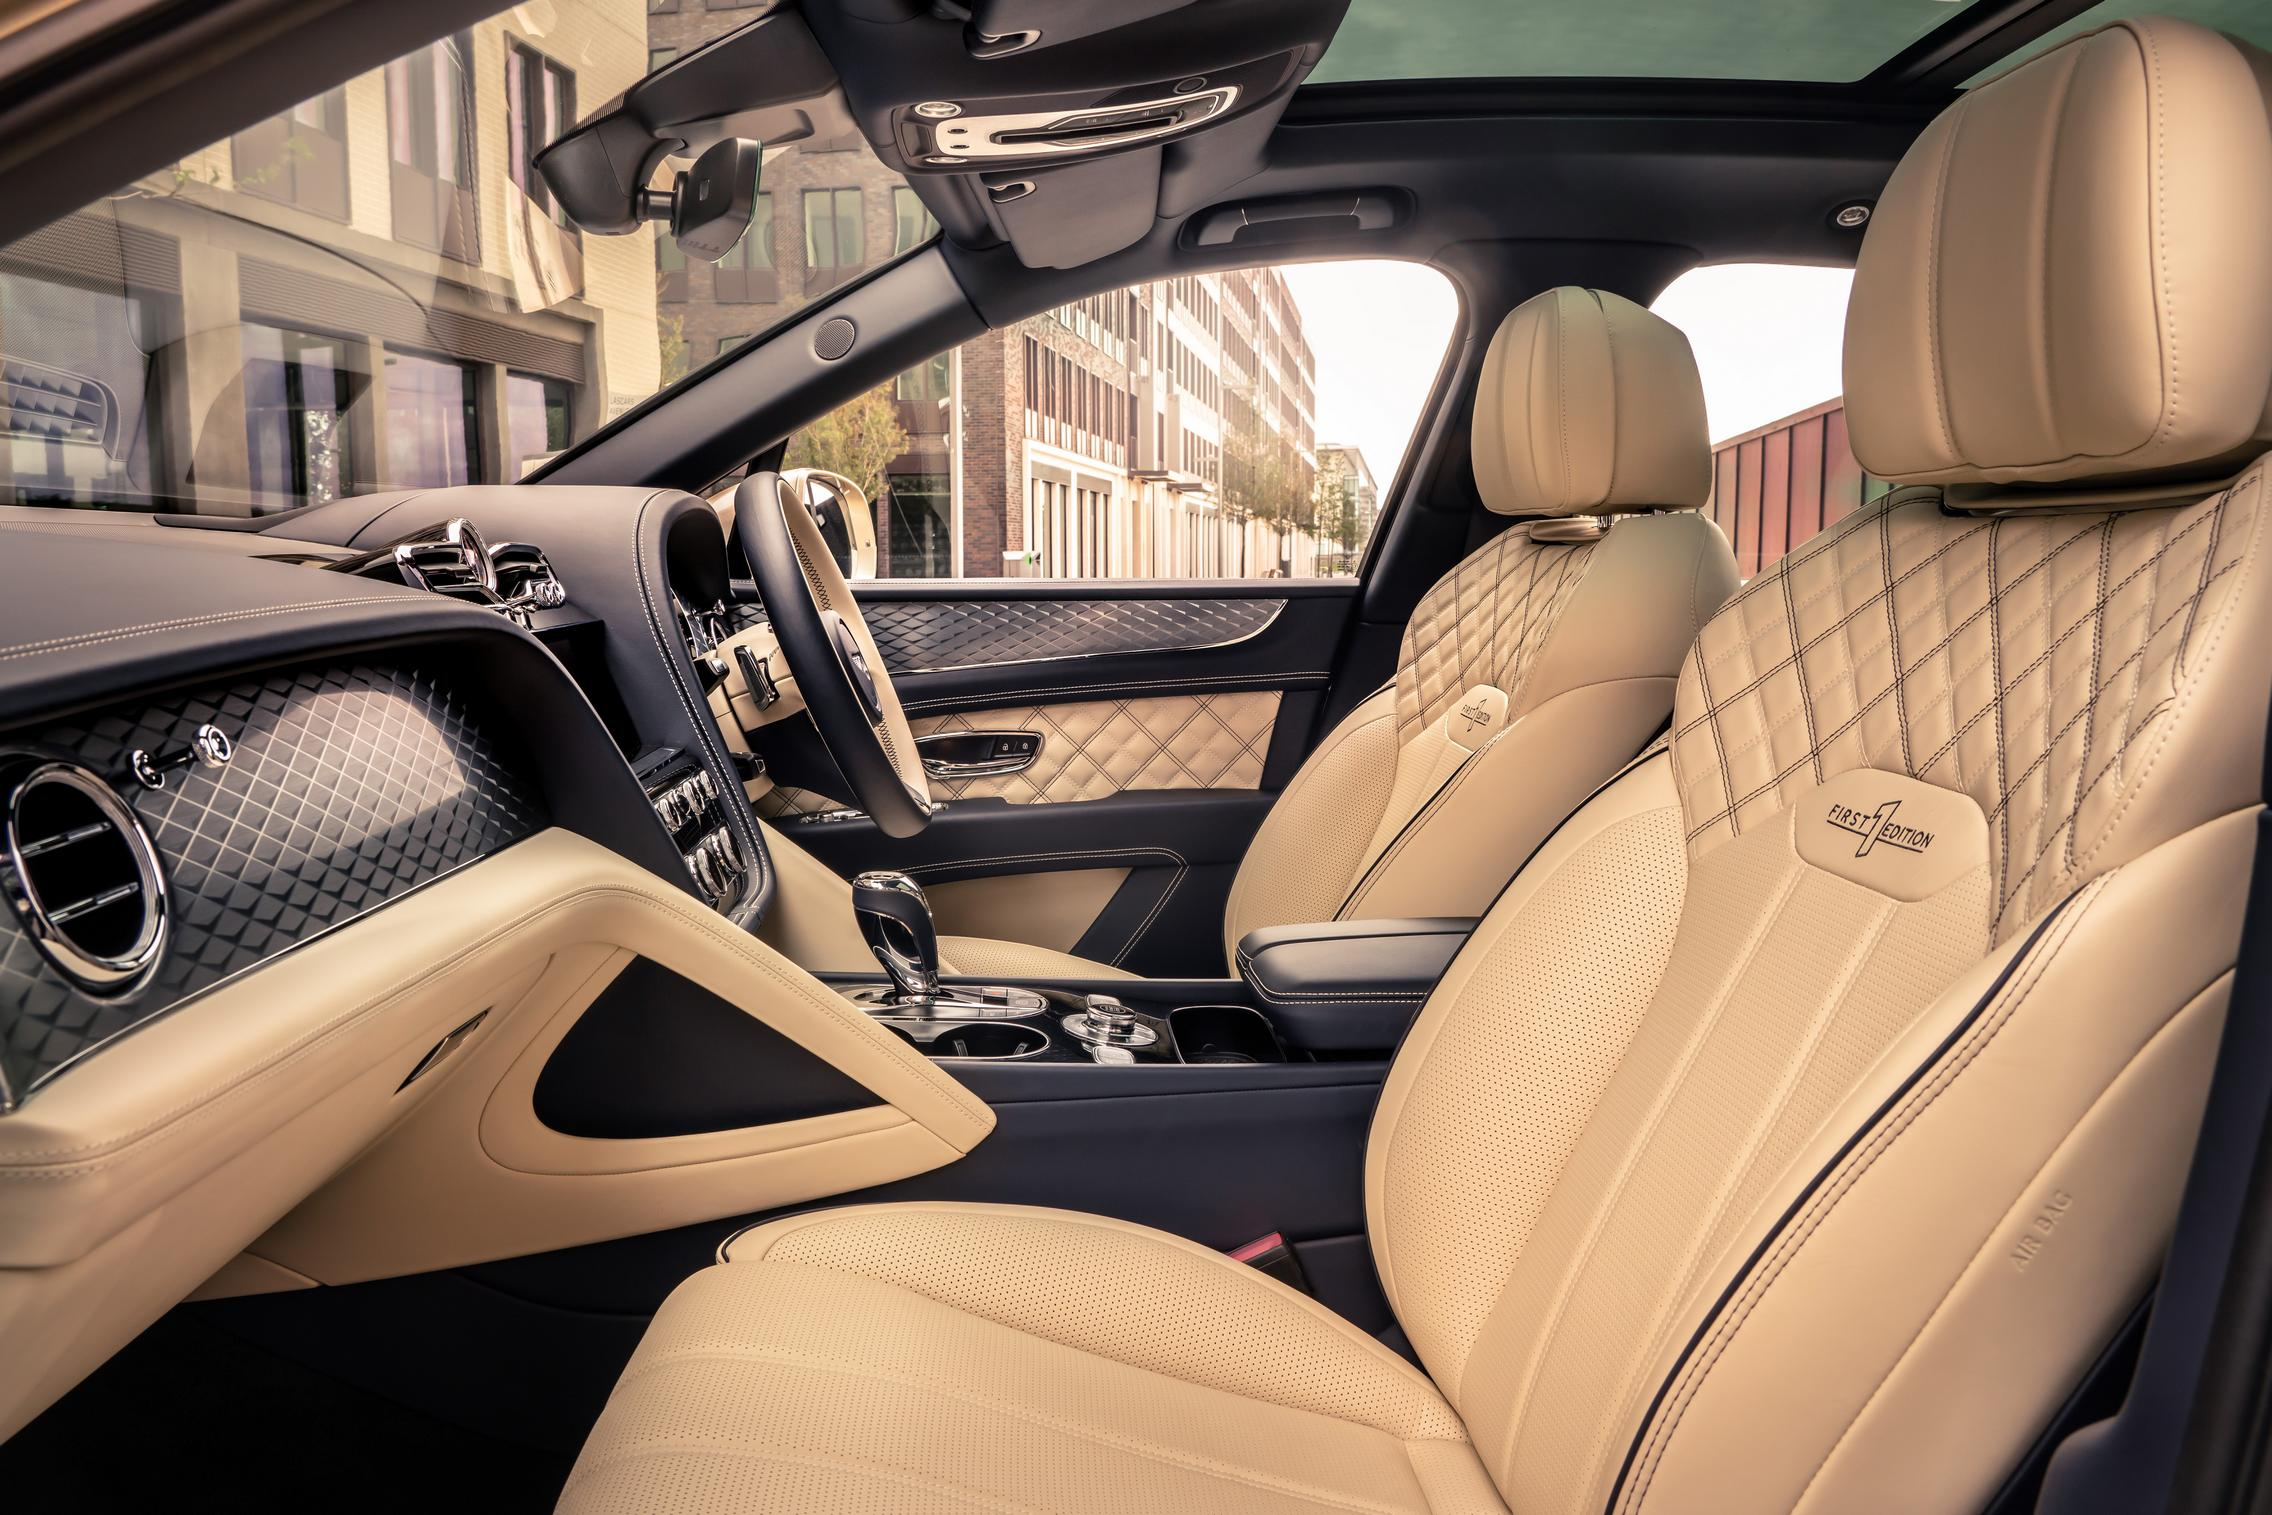 2021 Bentley Bentayga Hybrid cabin